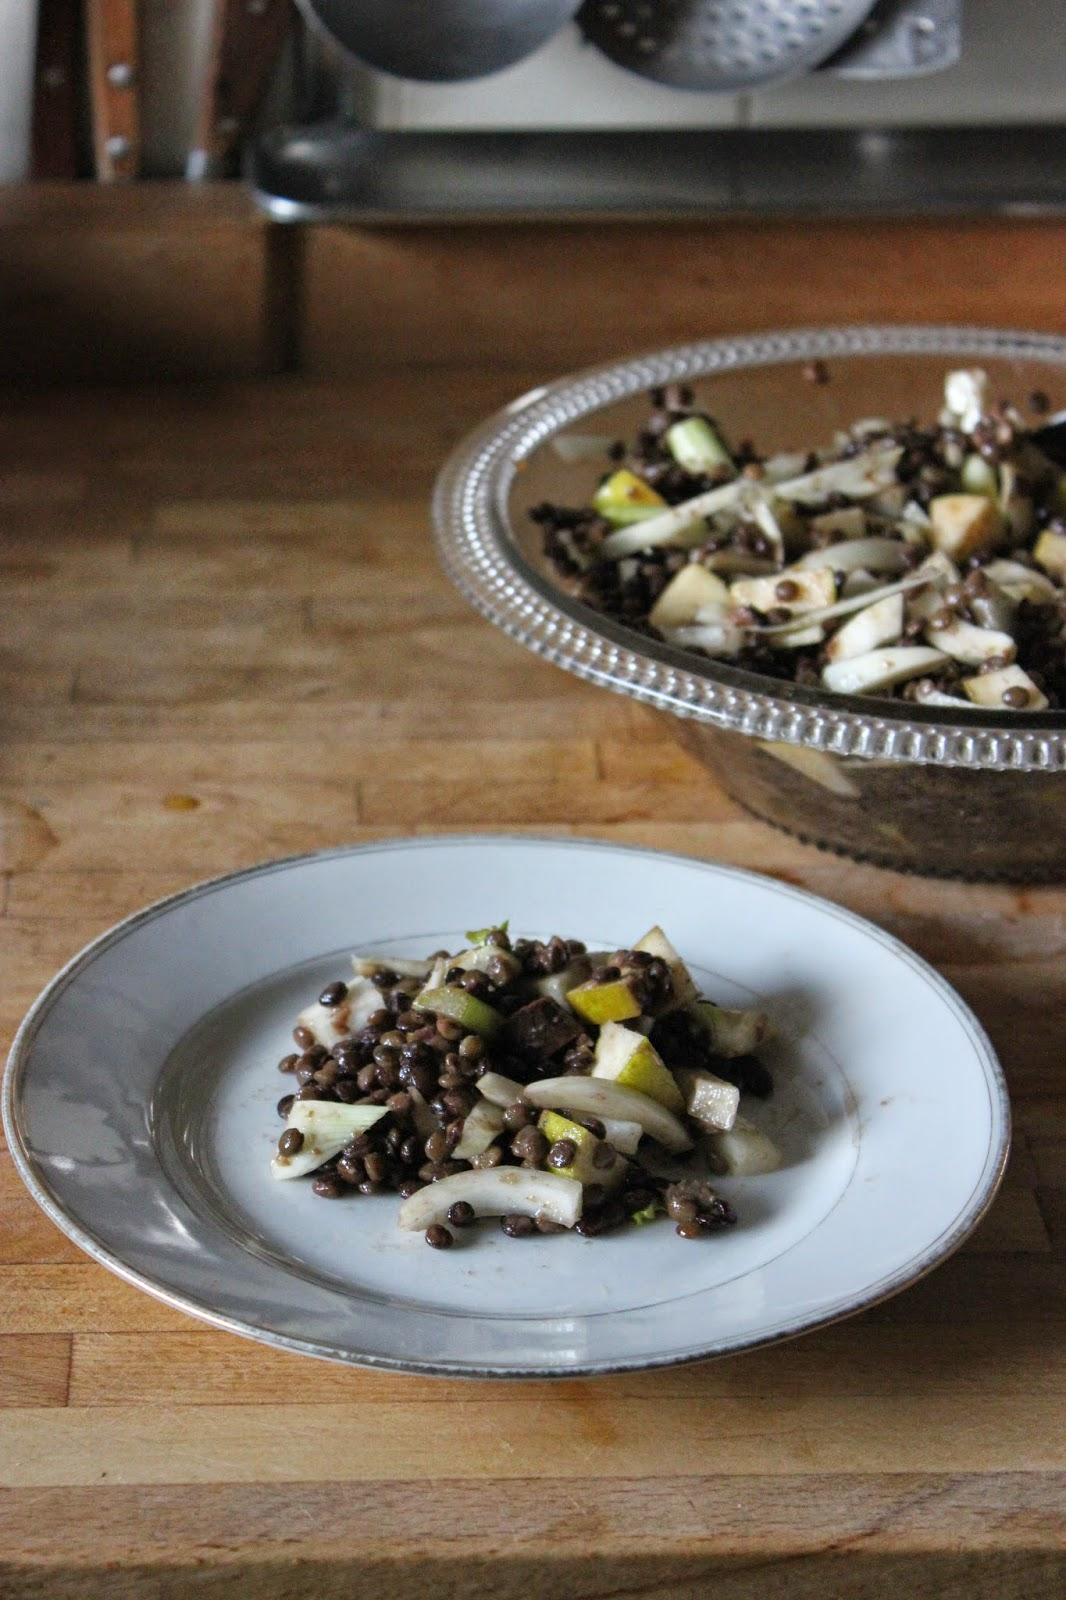 https://cuillereetsaladier.blogspot.com/2015/01/salade-de-lentilles-pommes-fenouil.html